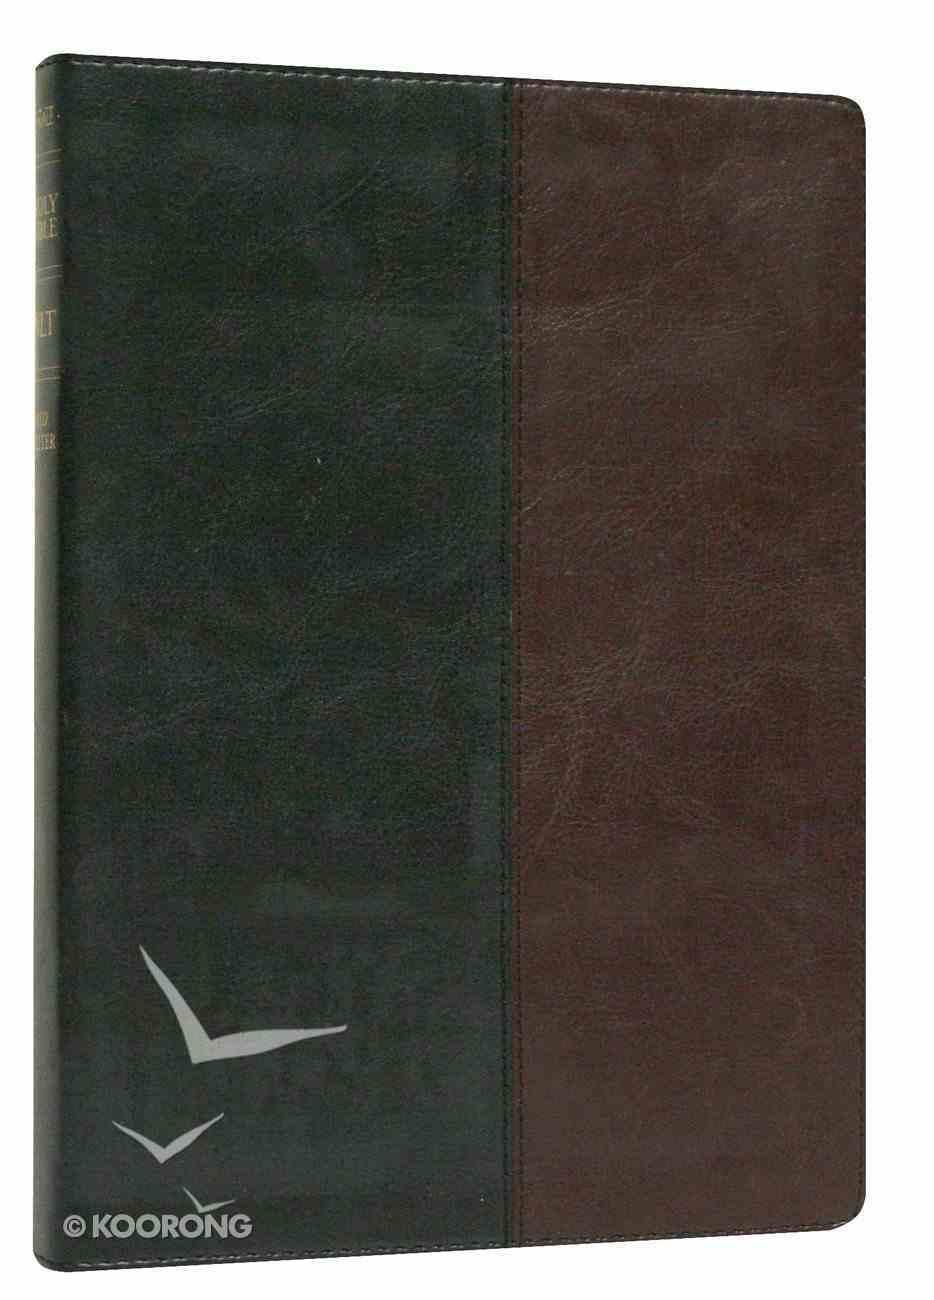 NLT Premium Slimline Reference Large Print Black/Burgundy Imitation Leather